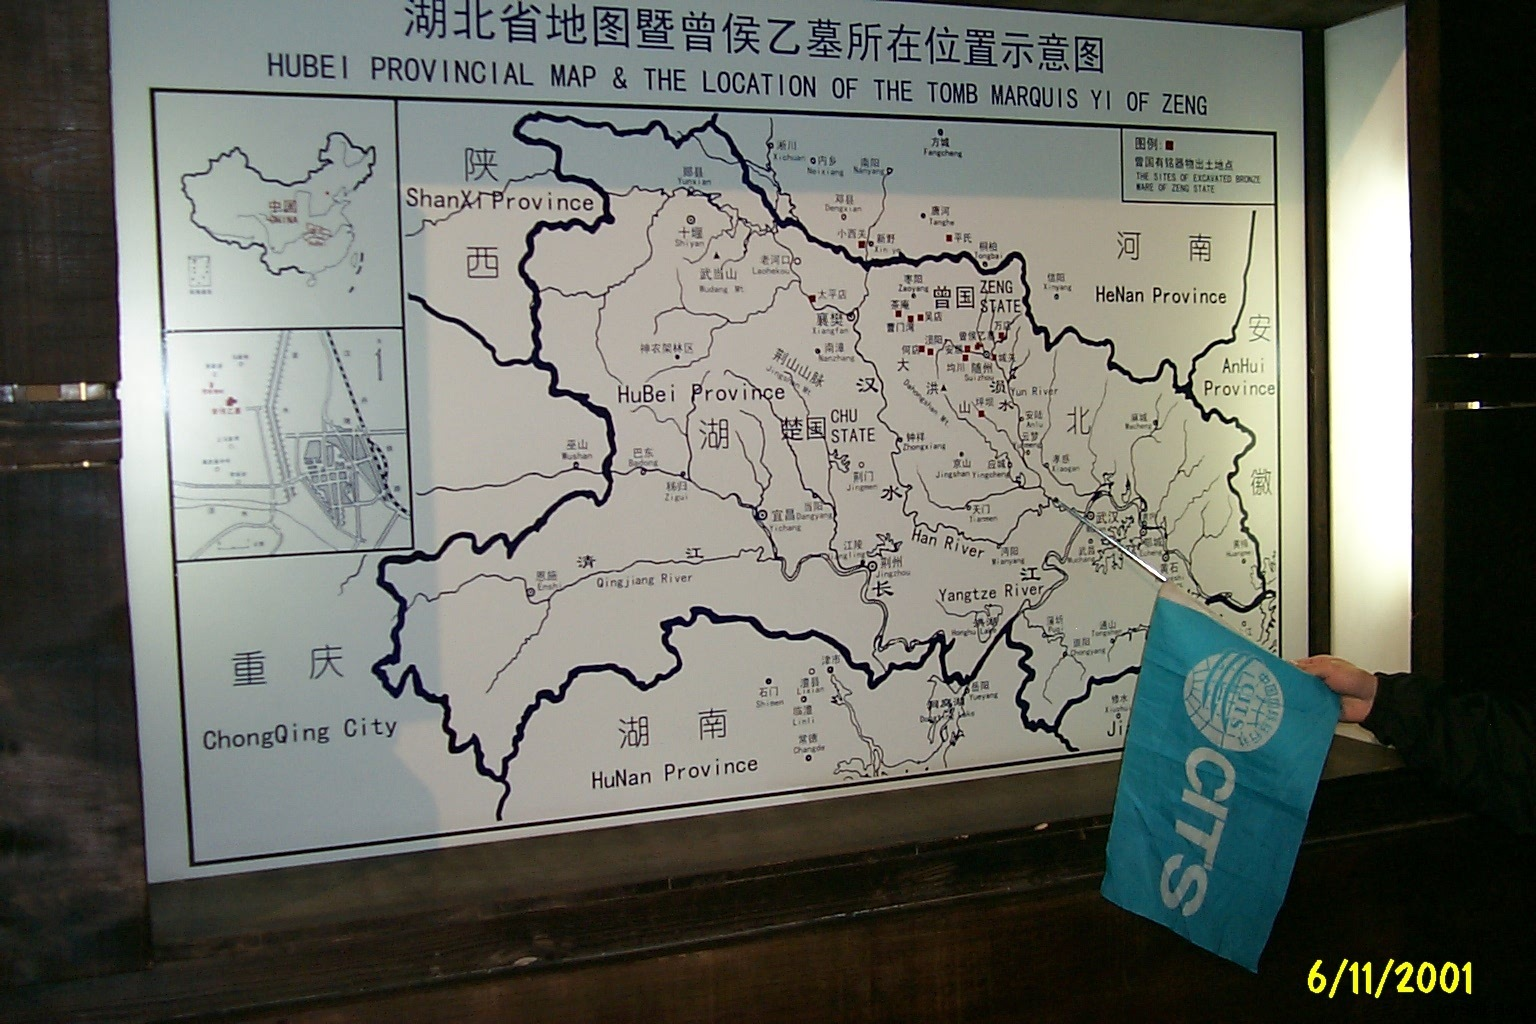 China5_Wuhan_4282